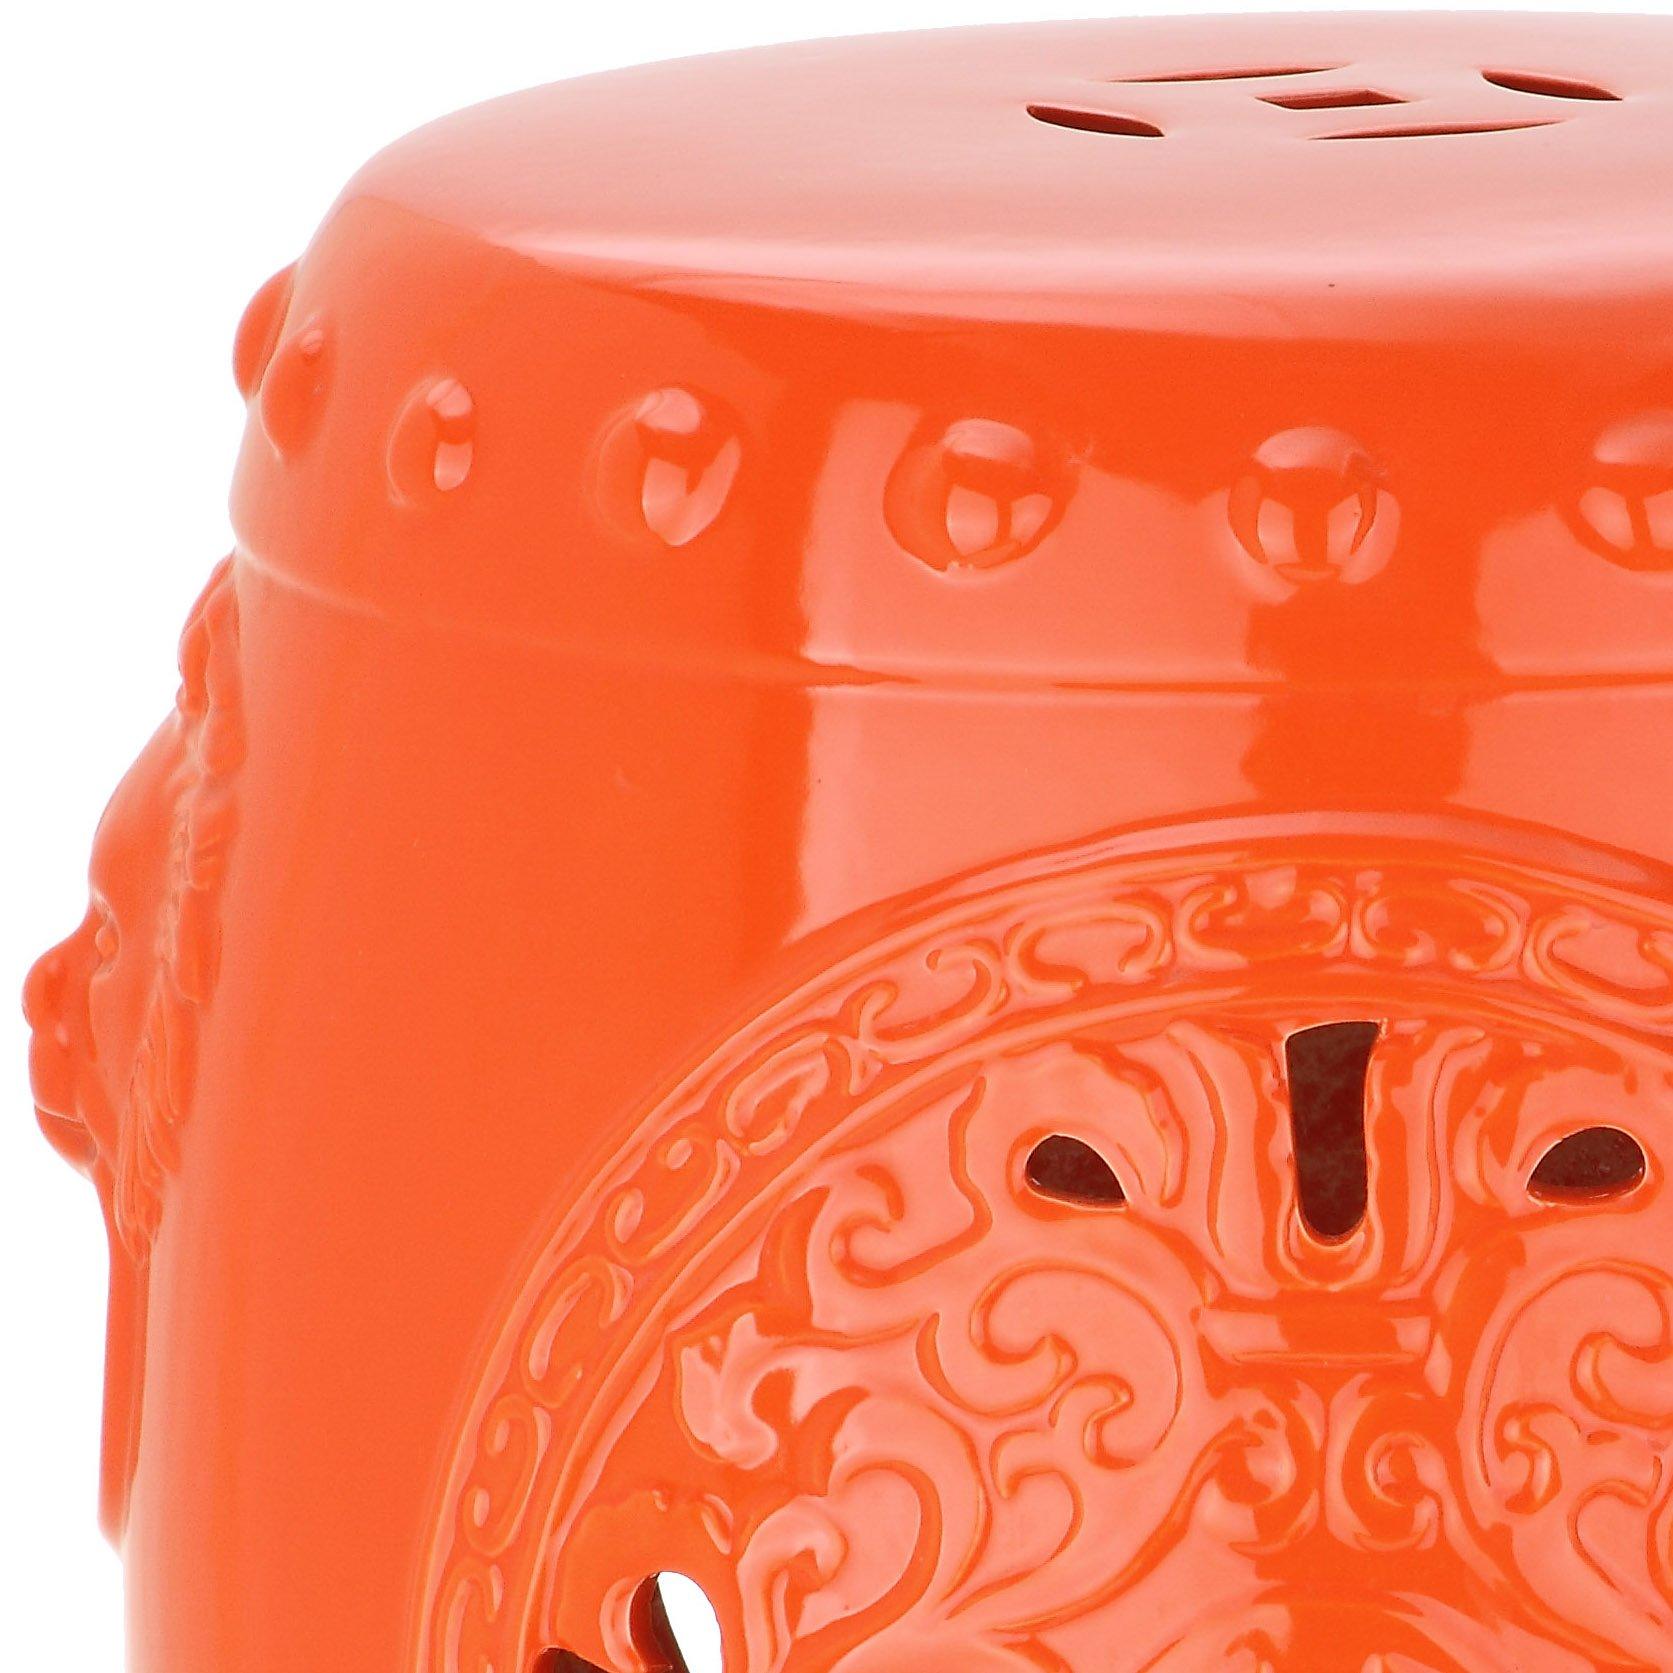 Safavieh Castle Gardens Collection Dragon Coin Orange Glazed Ceramic Garden Stool by Safavieh